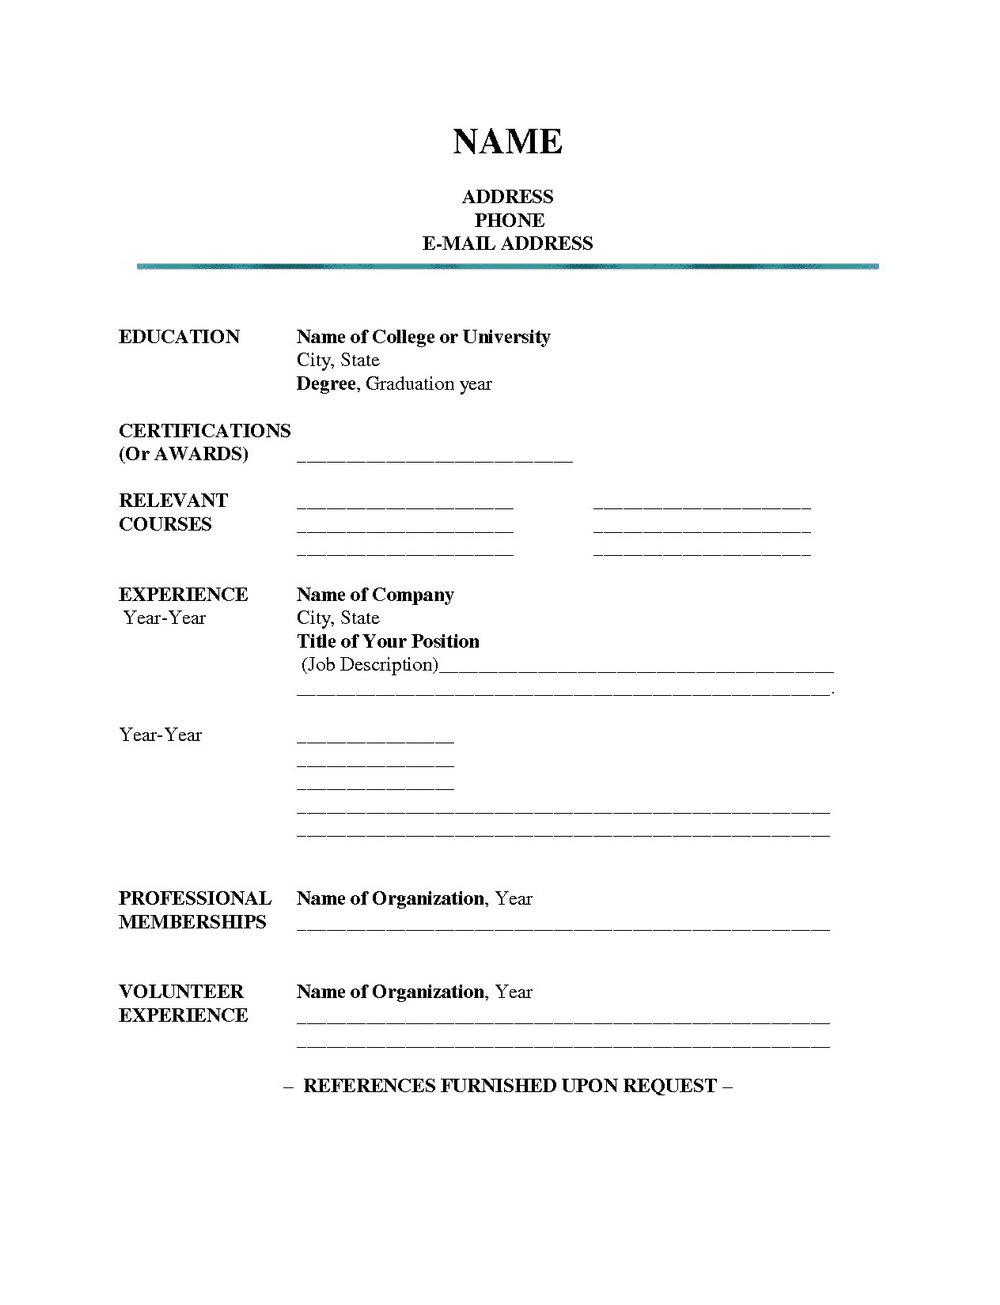 Blank Resume Form Pdf Download